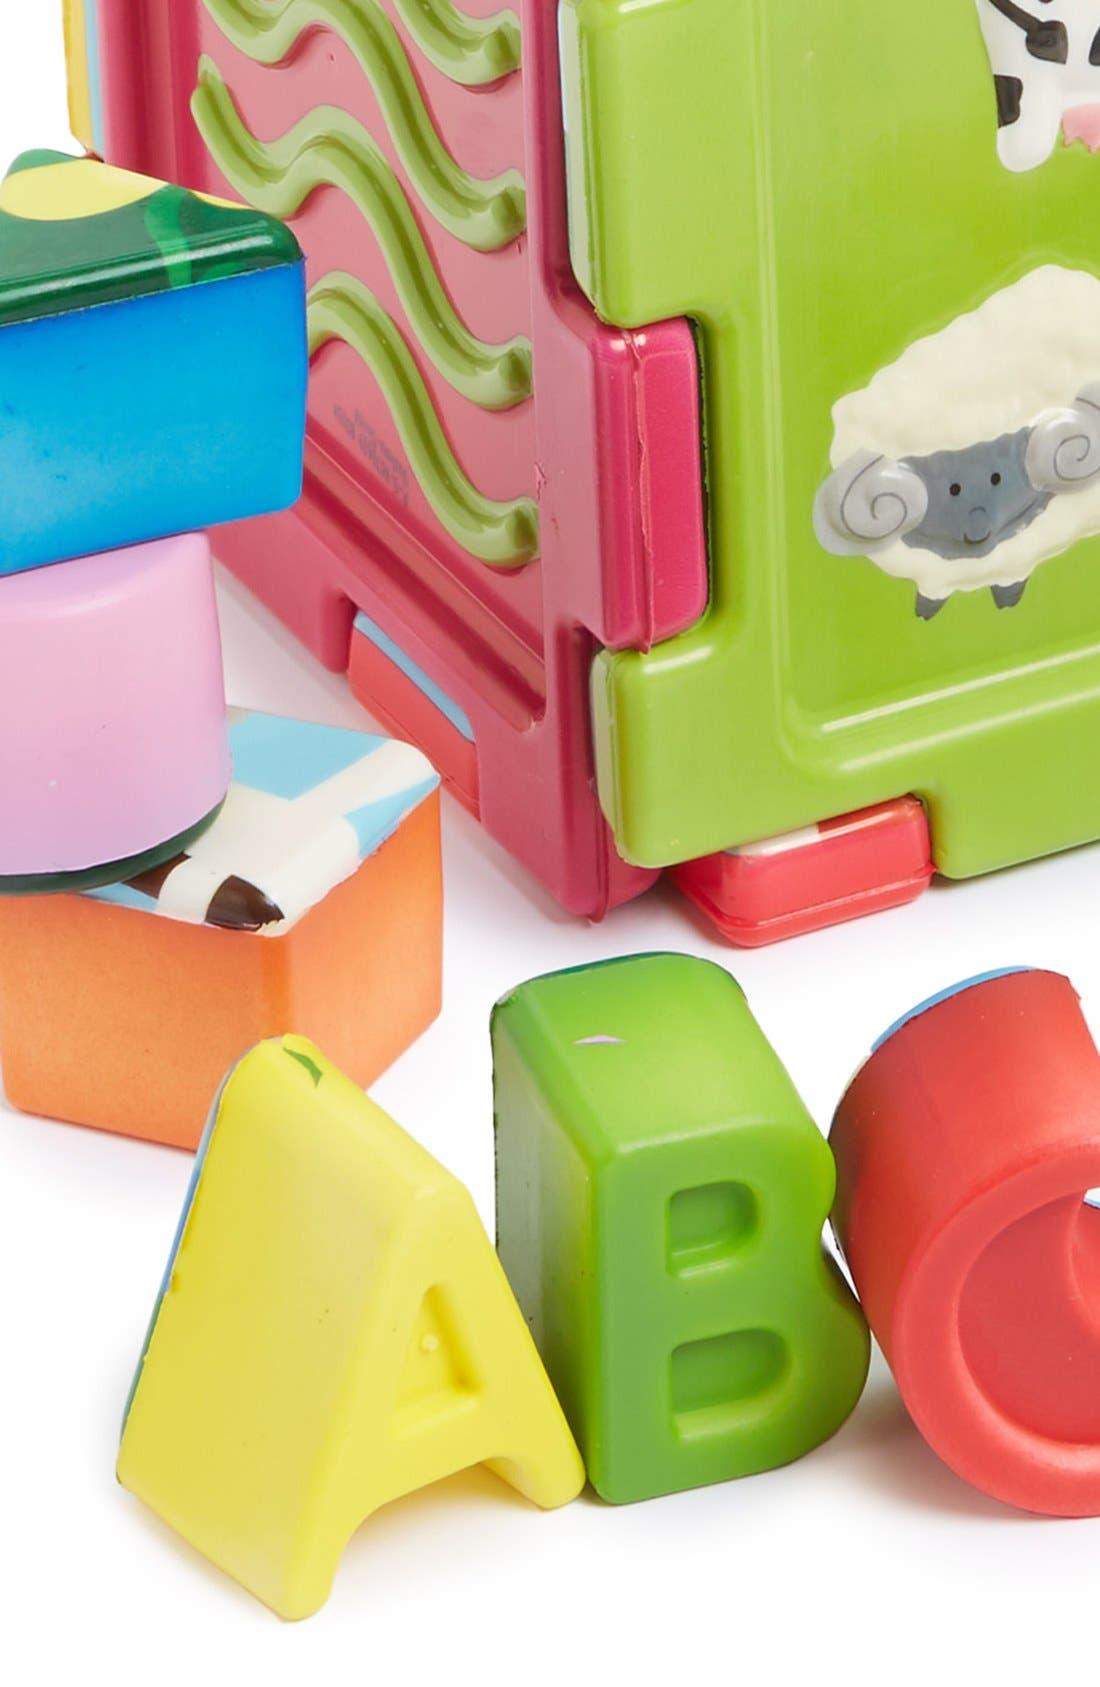 'Sensory Cube' Toy Set,                             Alternate thumbnail 2, color,                             400